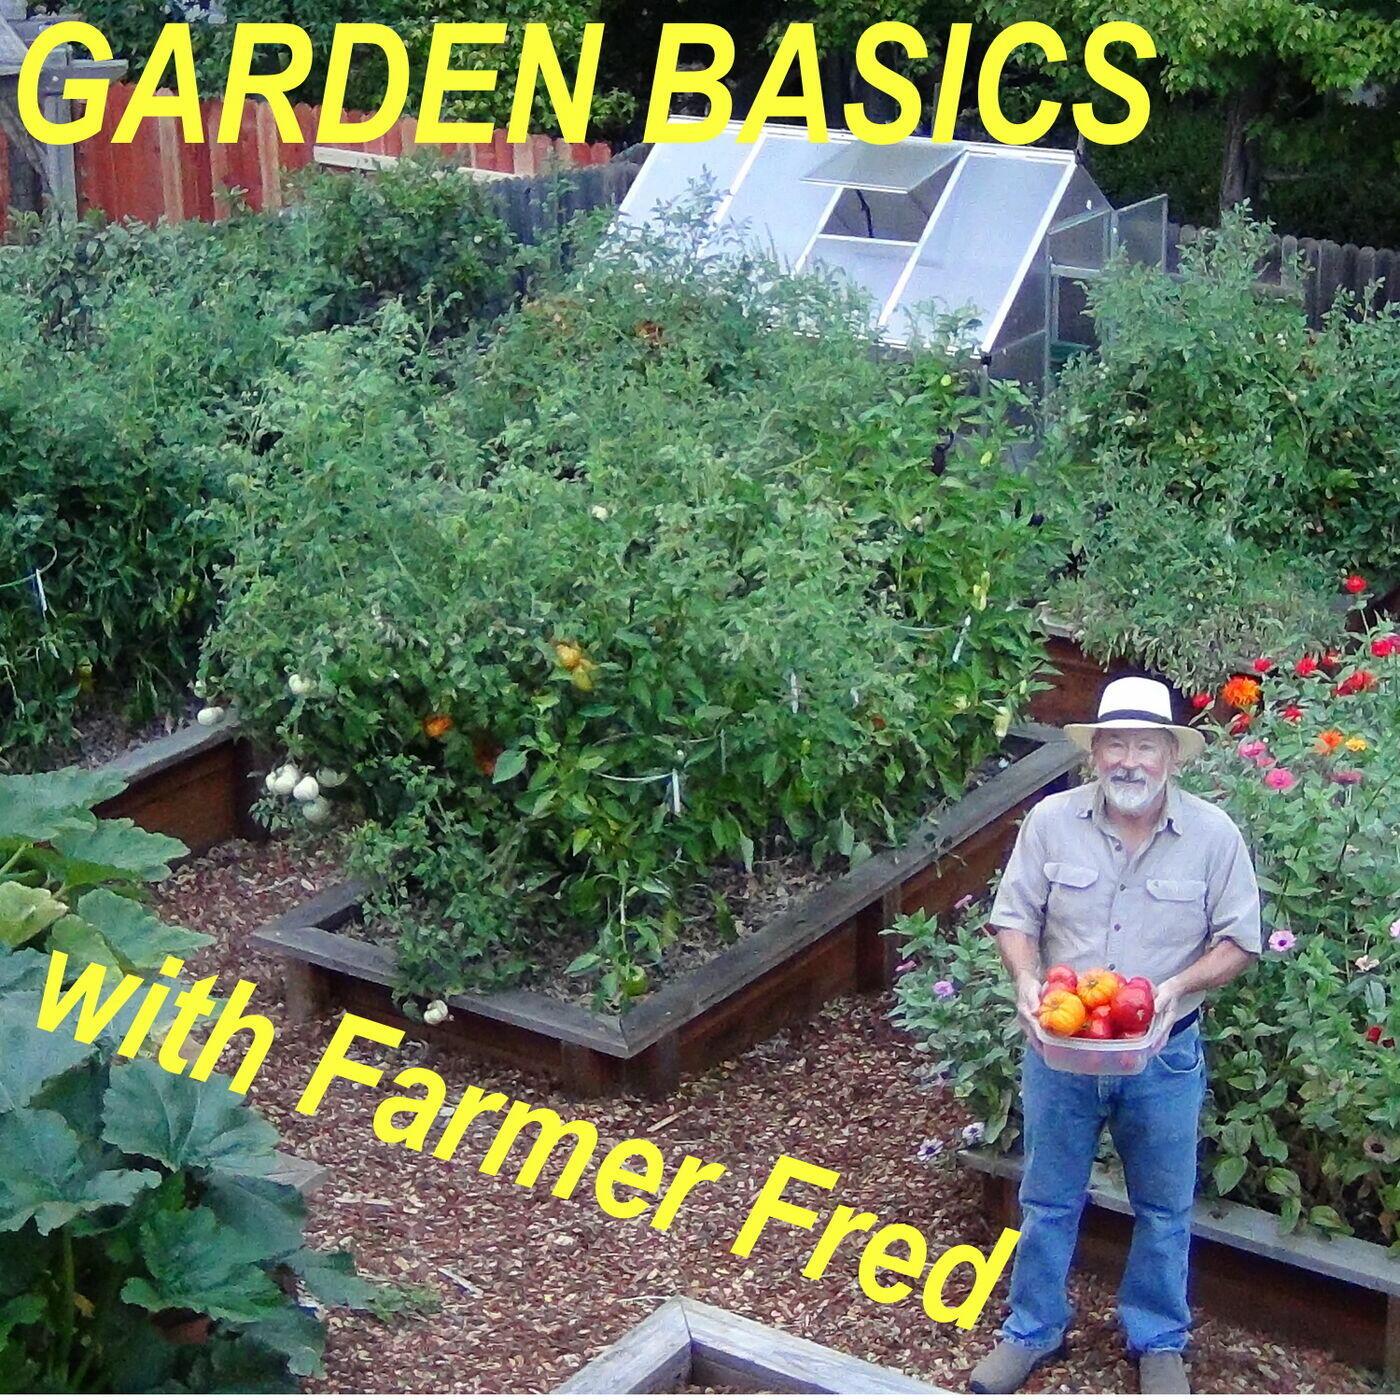 Garden Basics with Farmer Fred